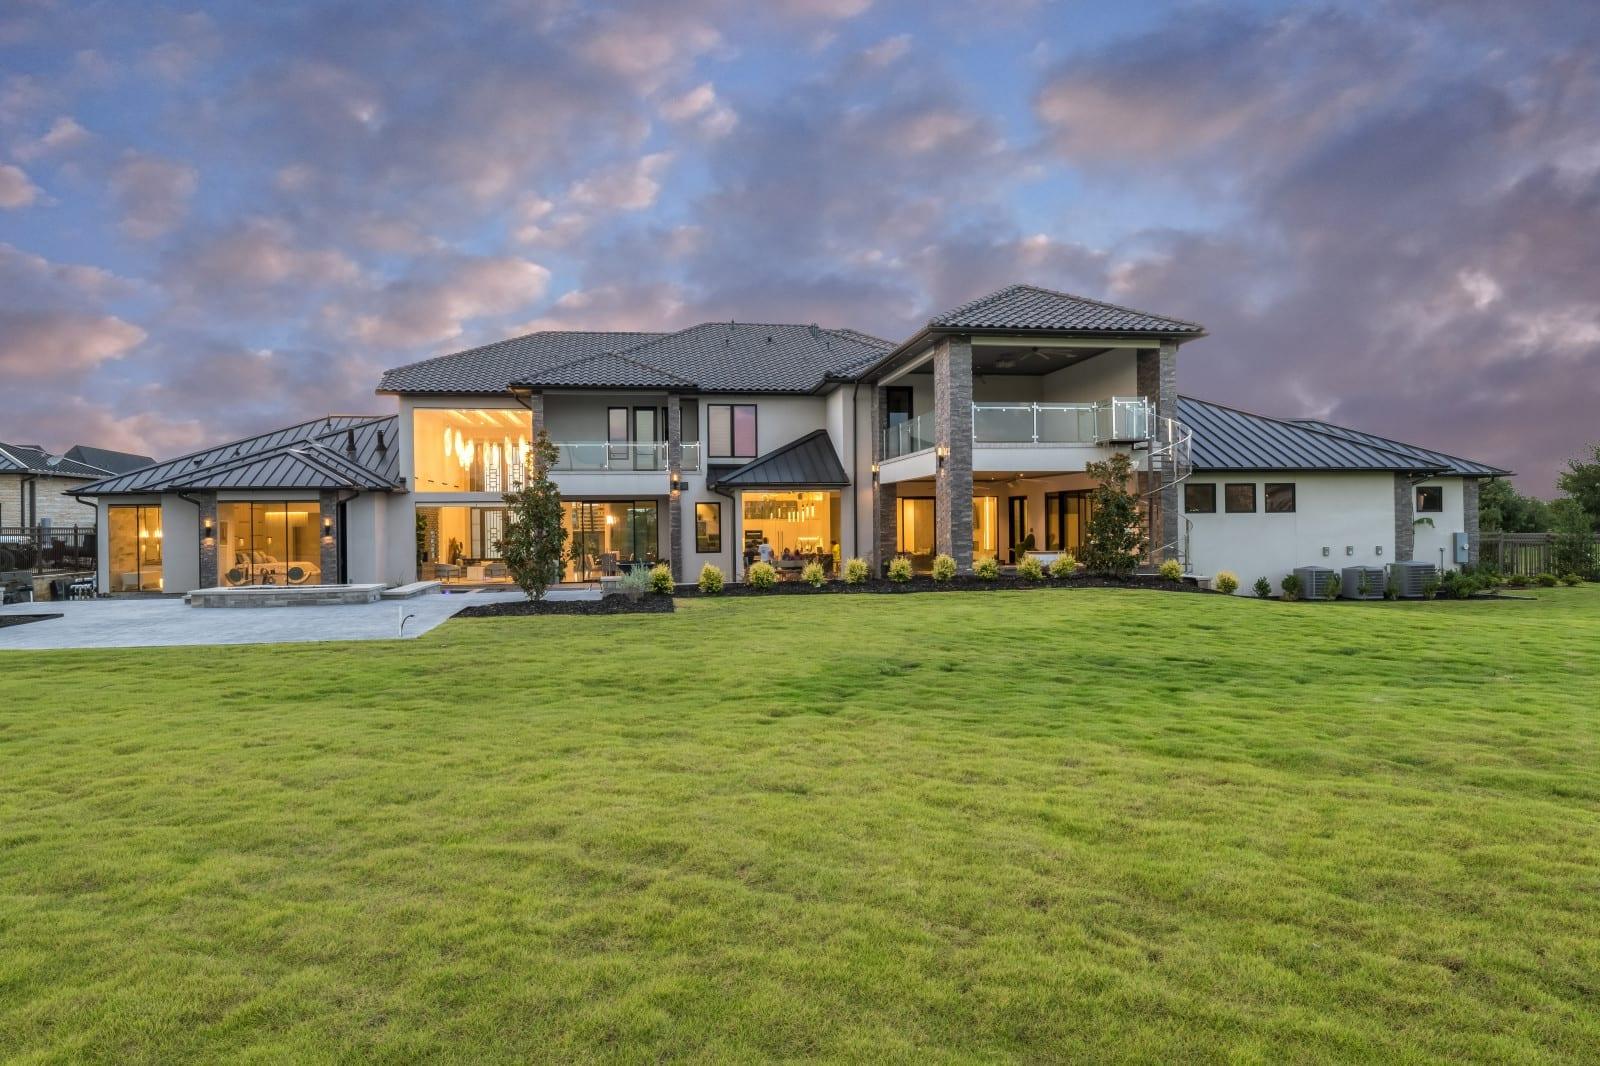 Custom Home Build and Interior Design # 14 - Millennial Design + Build, Custom Home Builders in Dallas Texas, modern style homes, Property Evaluator, Interior Designers, using BIM Technology and Home 3D Model.